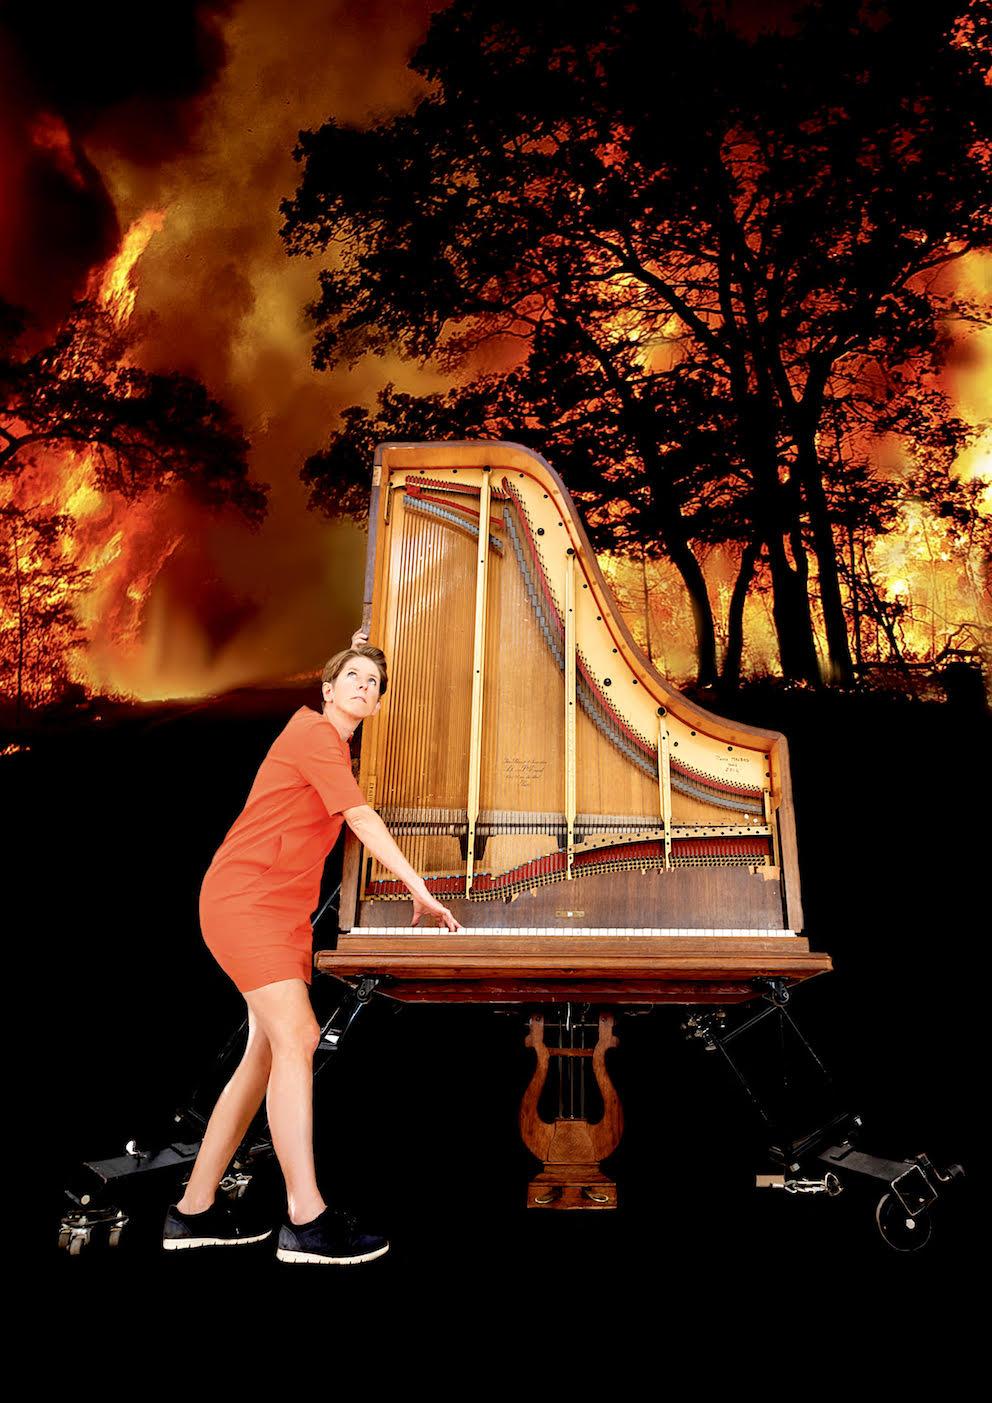 Sarah Nicolls will perform 12 Years at Sage Gateshead as part of Gateshead Jazz 2020